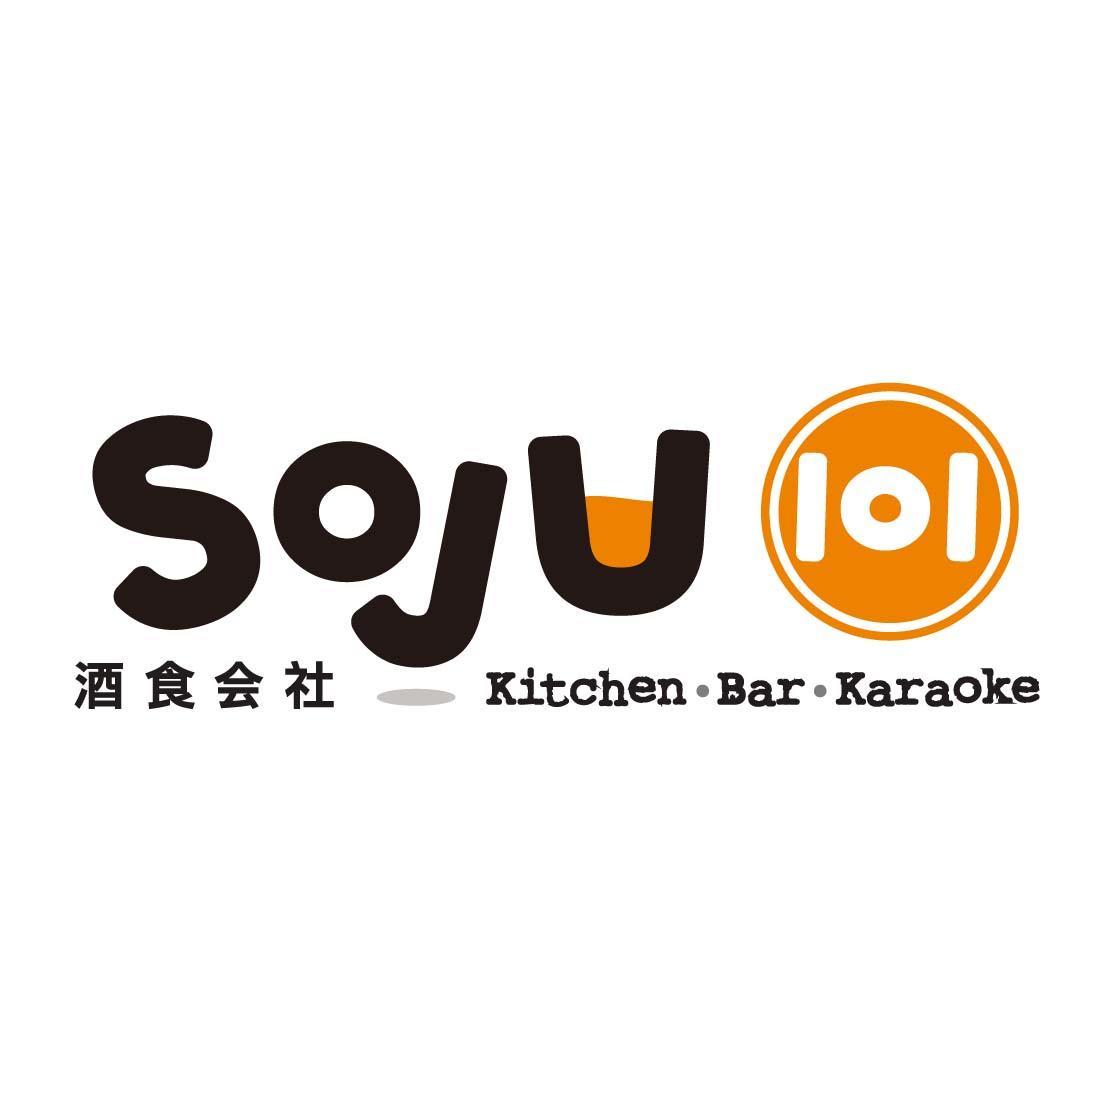 Soju 101 Karaoke, Bar & Korean Kitchen